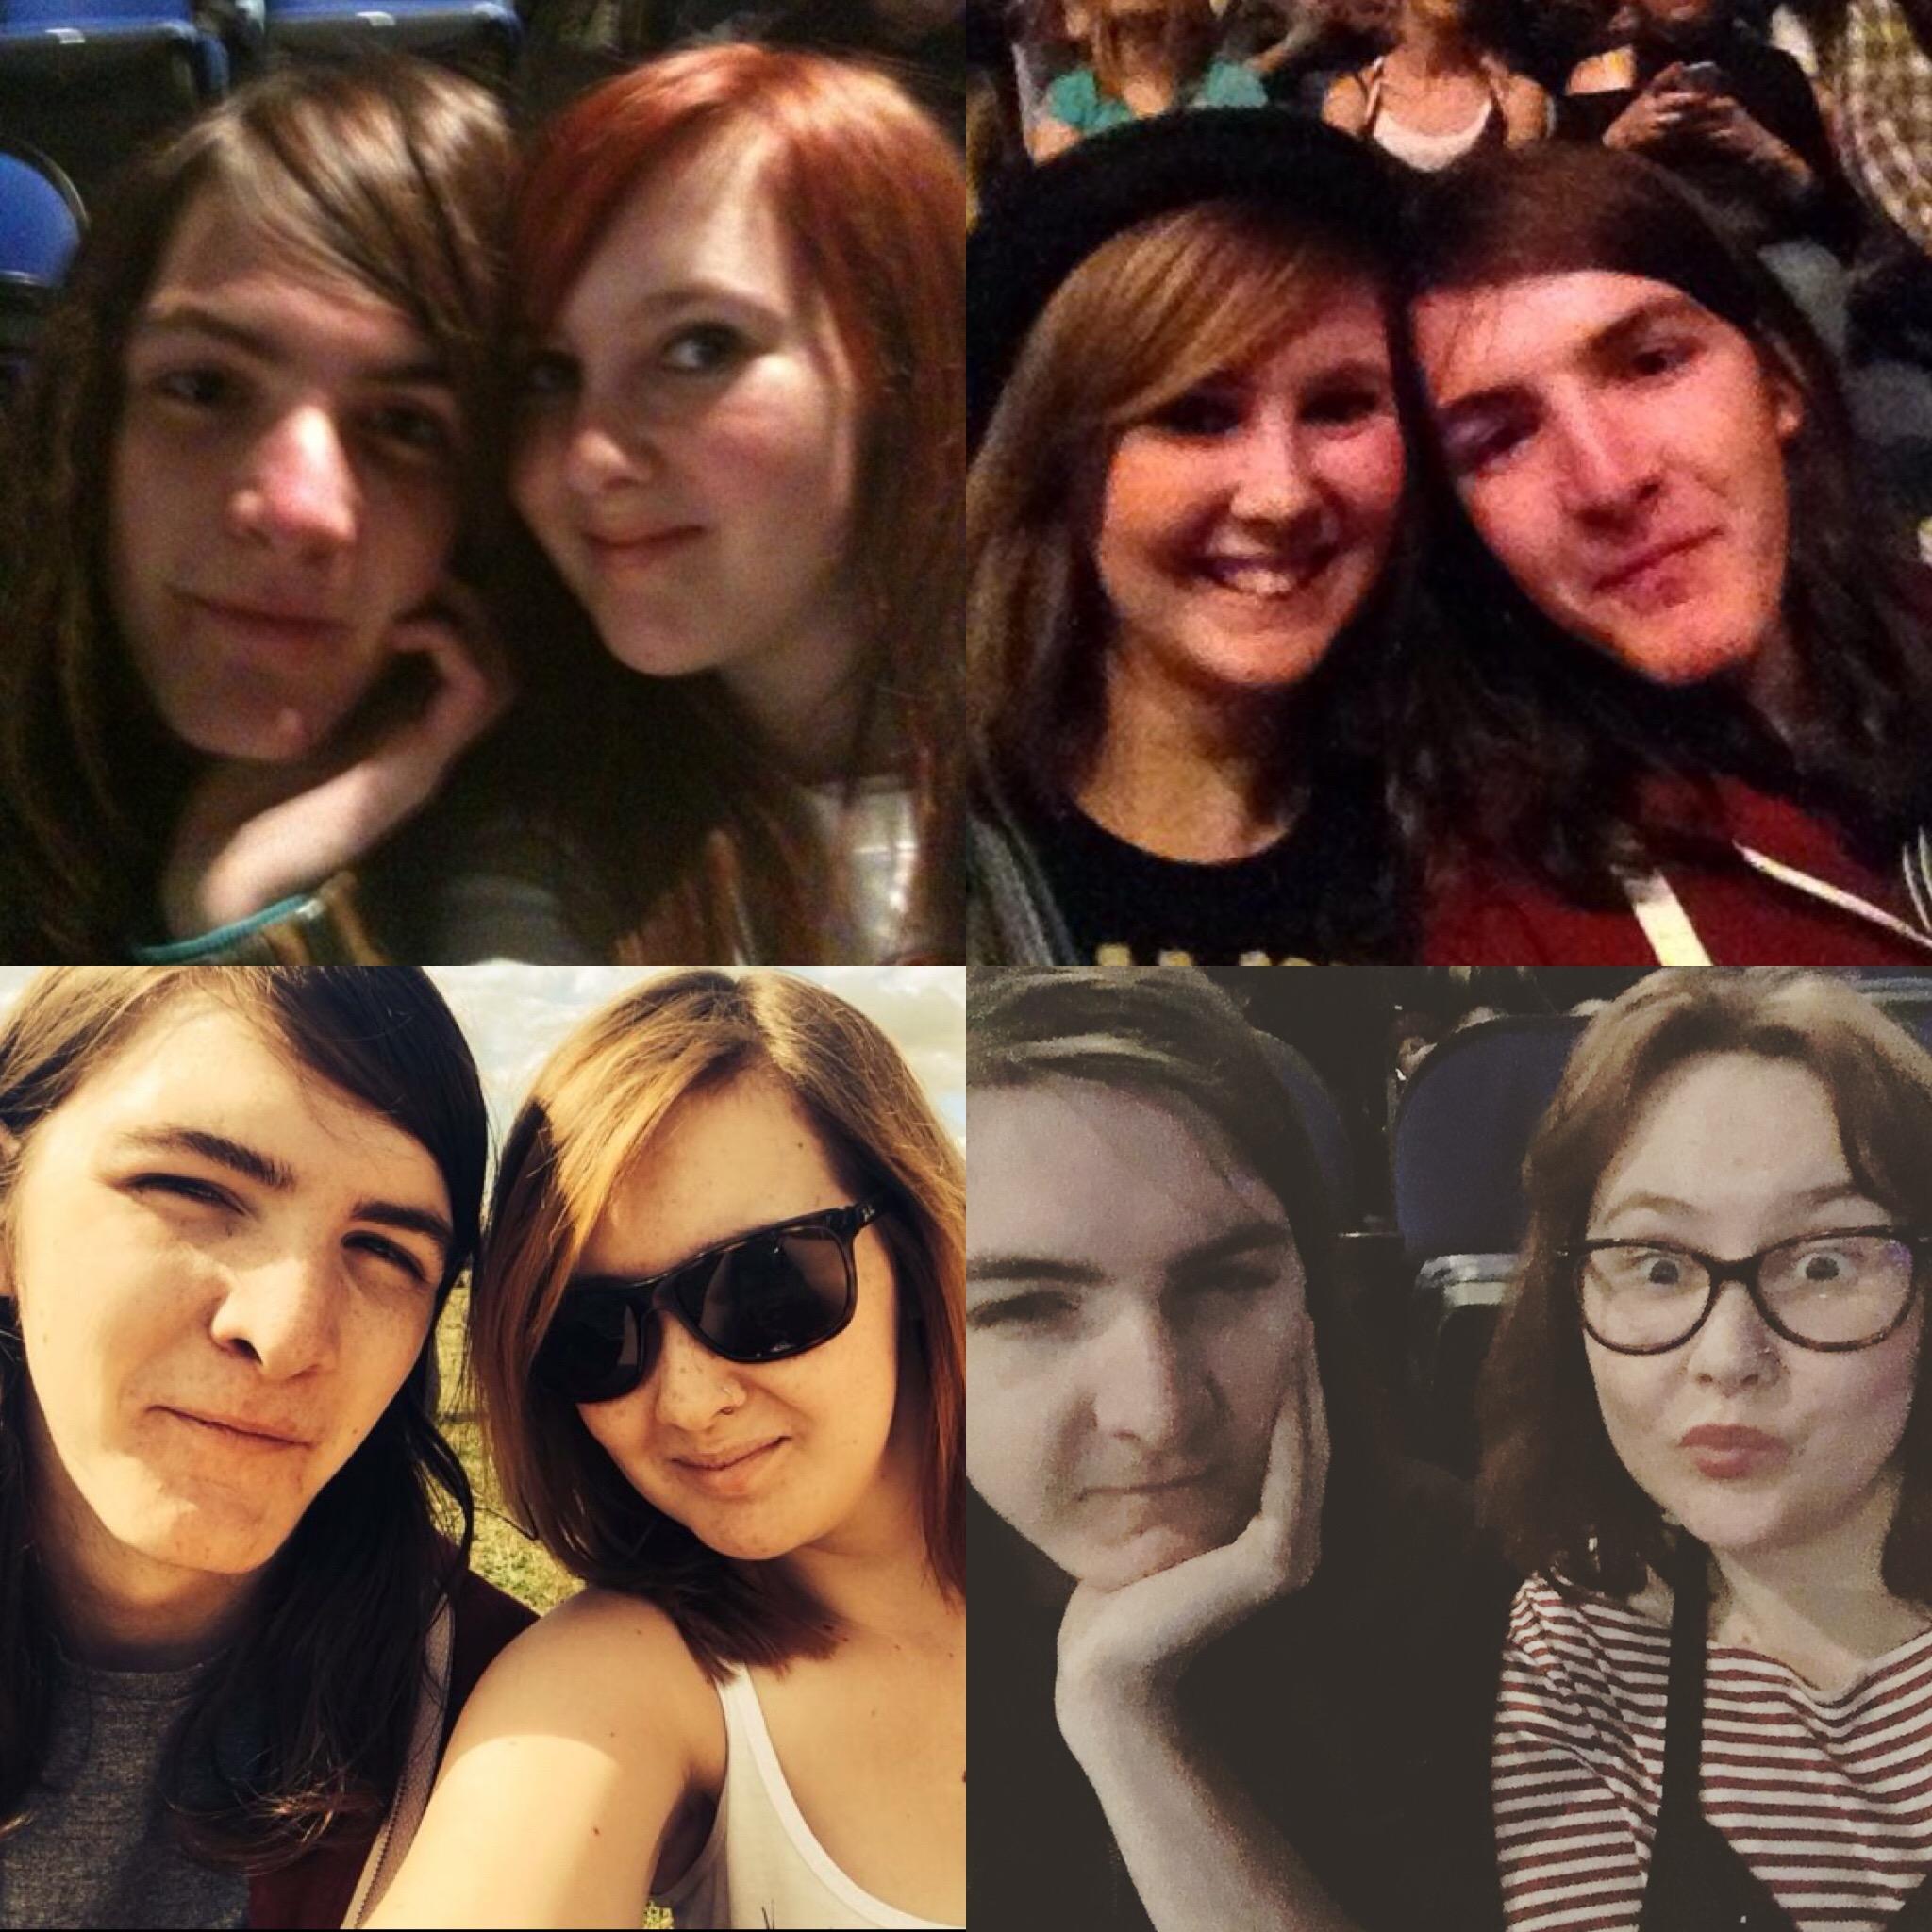 Couple Paramore 2010, 2013, 2014, 2018